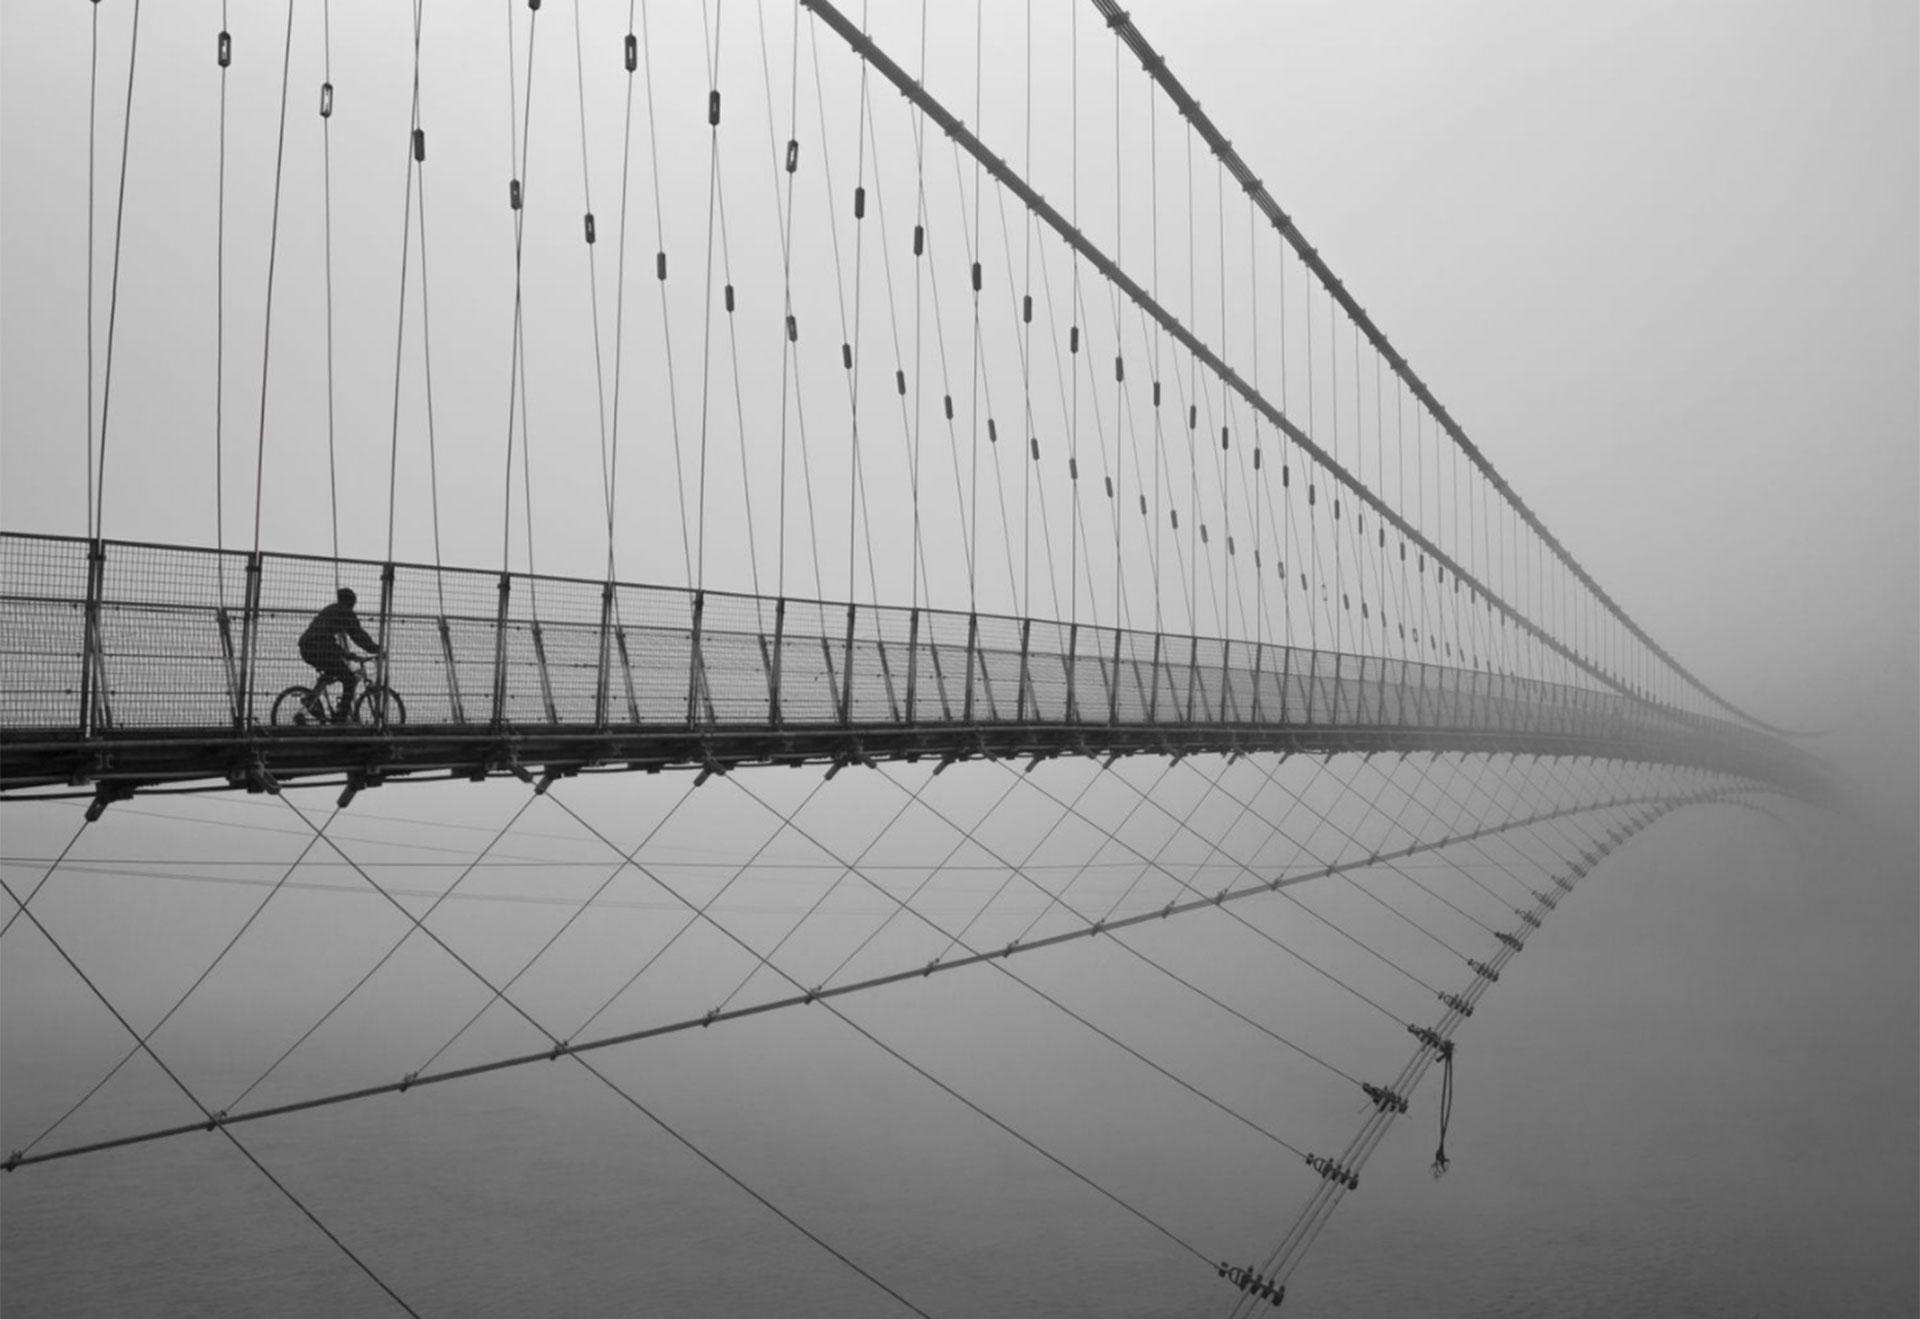 """Viajando al cielo"". Puente de Rham Jhula en Rishikesh, Uttarakhand, India."